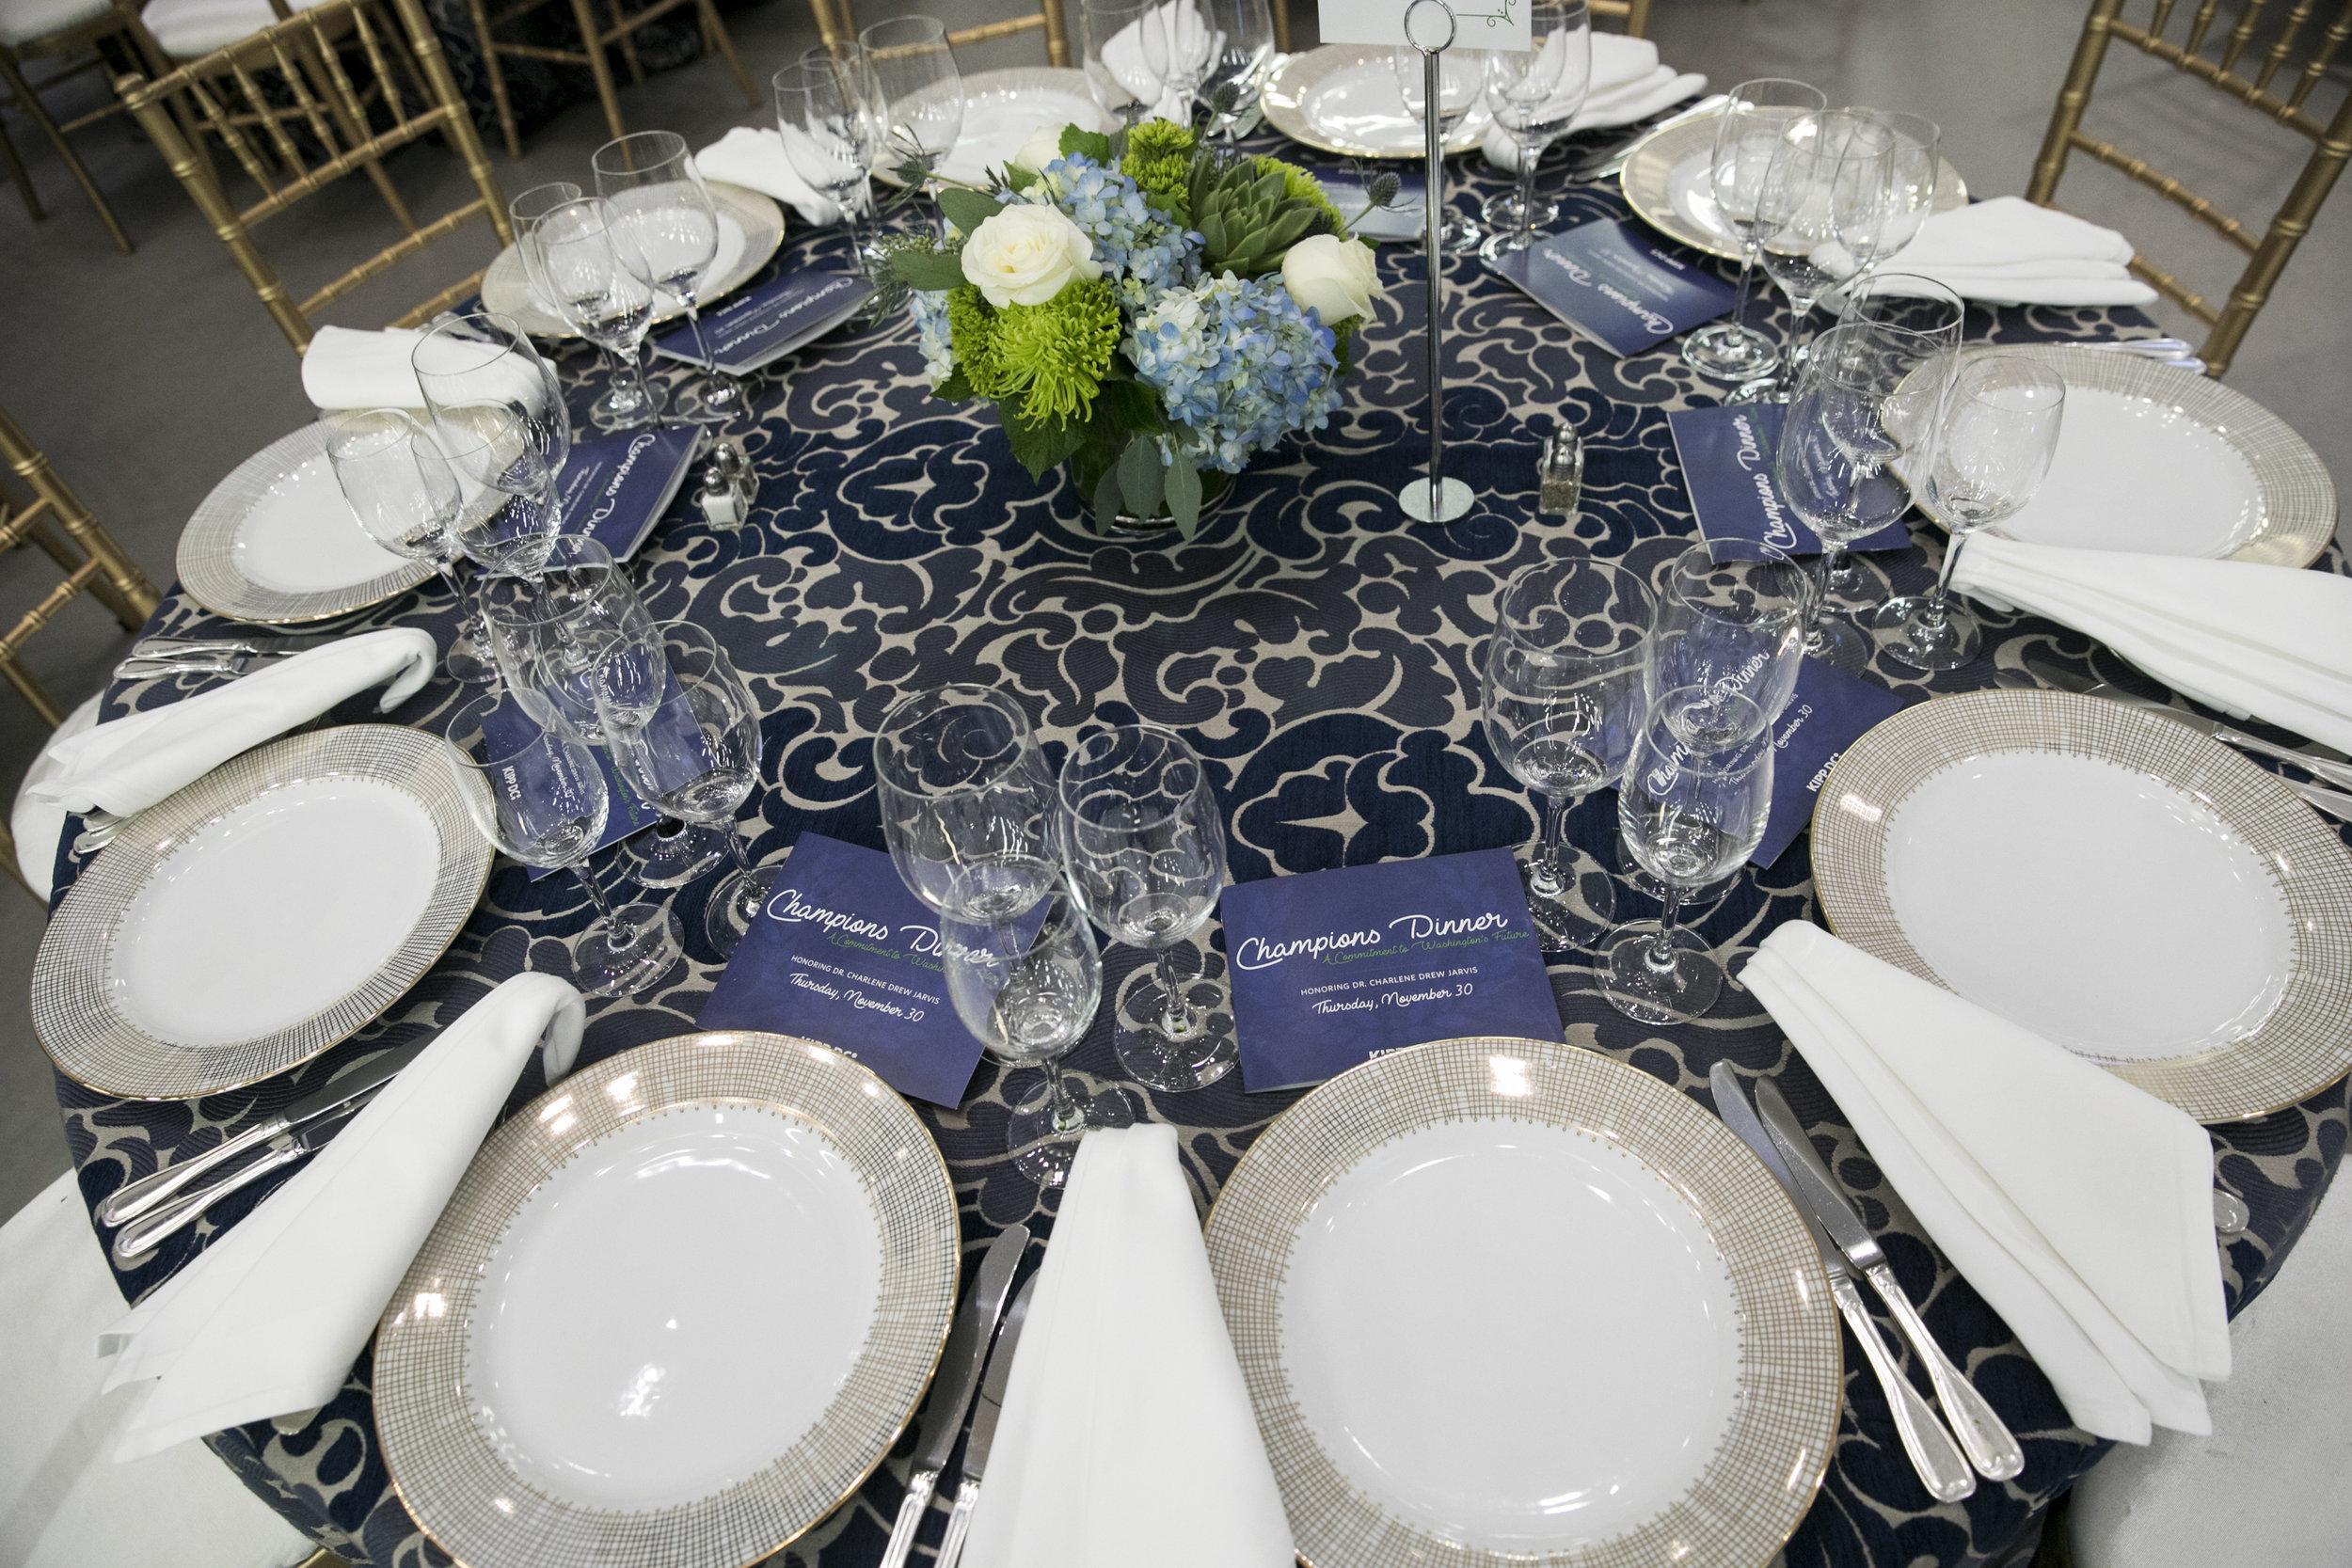 20171130_KIPP_Champions_Dinner_024.jpg